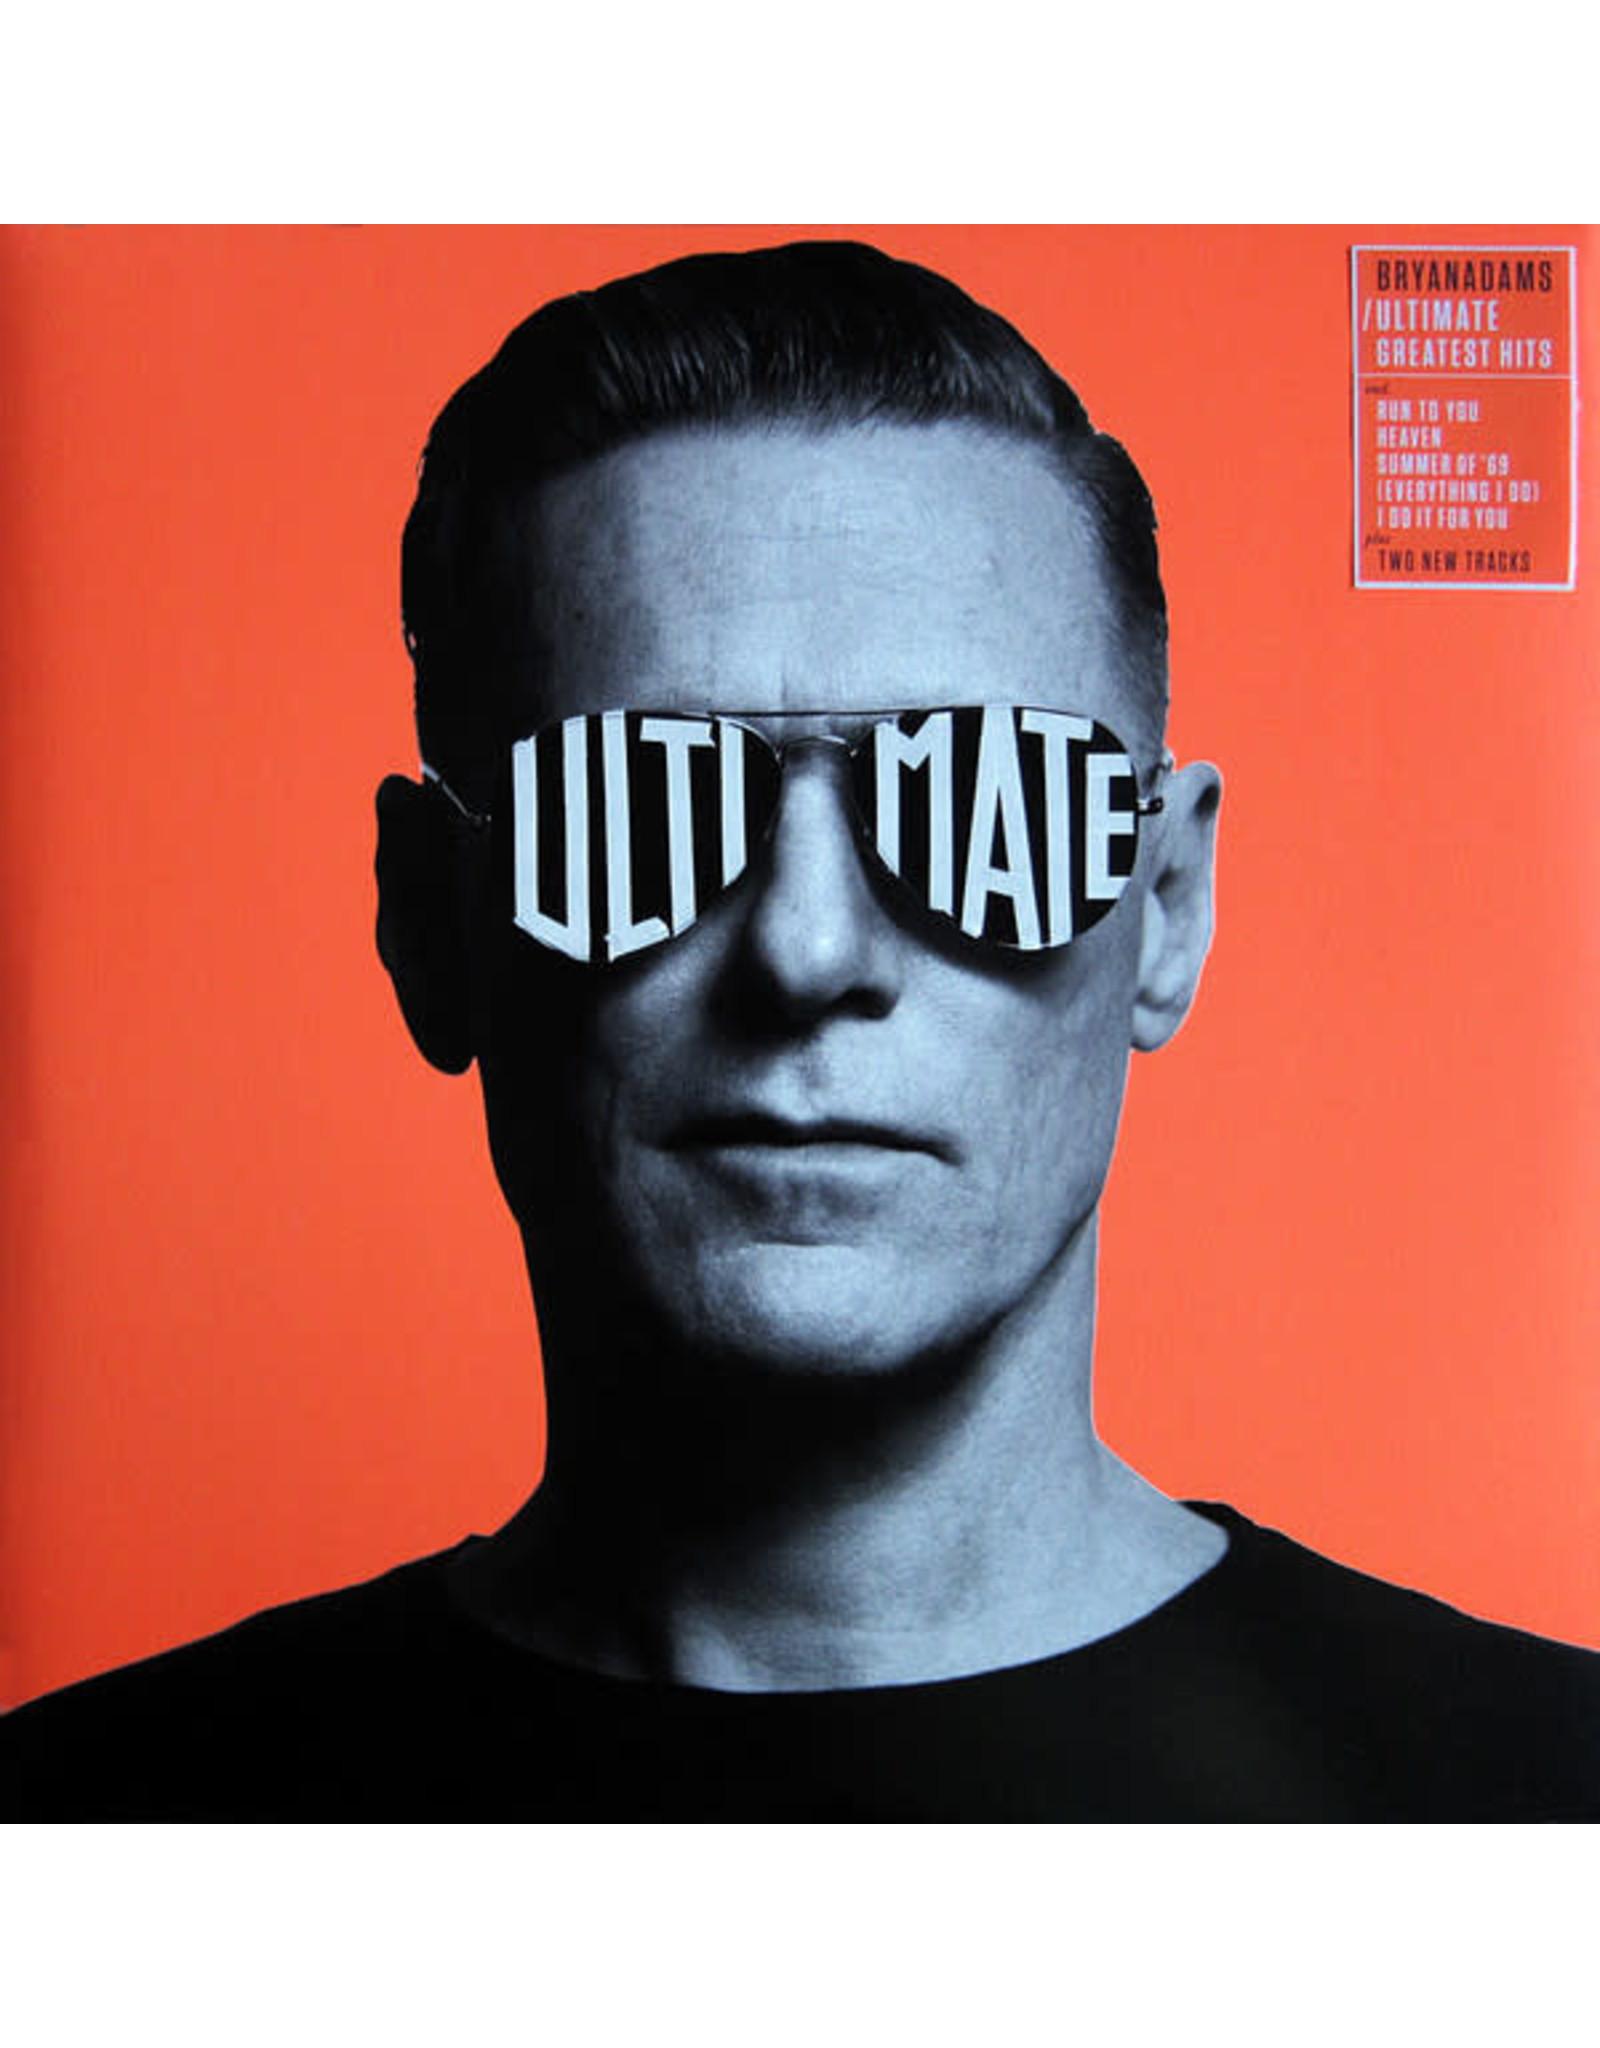 Bryan Adams - Ultimate: Greatest Hits